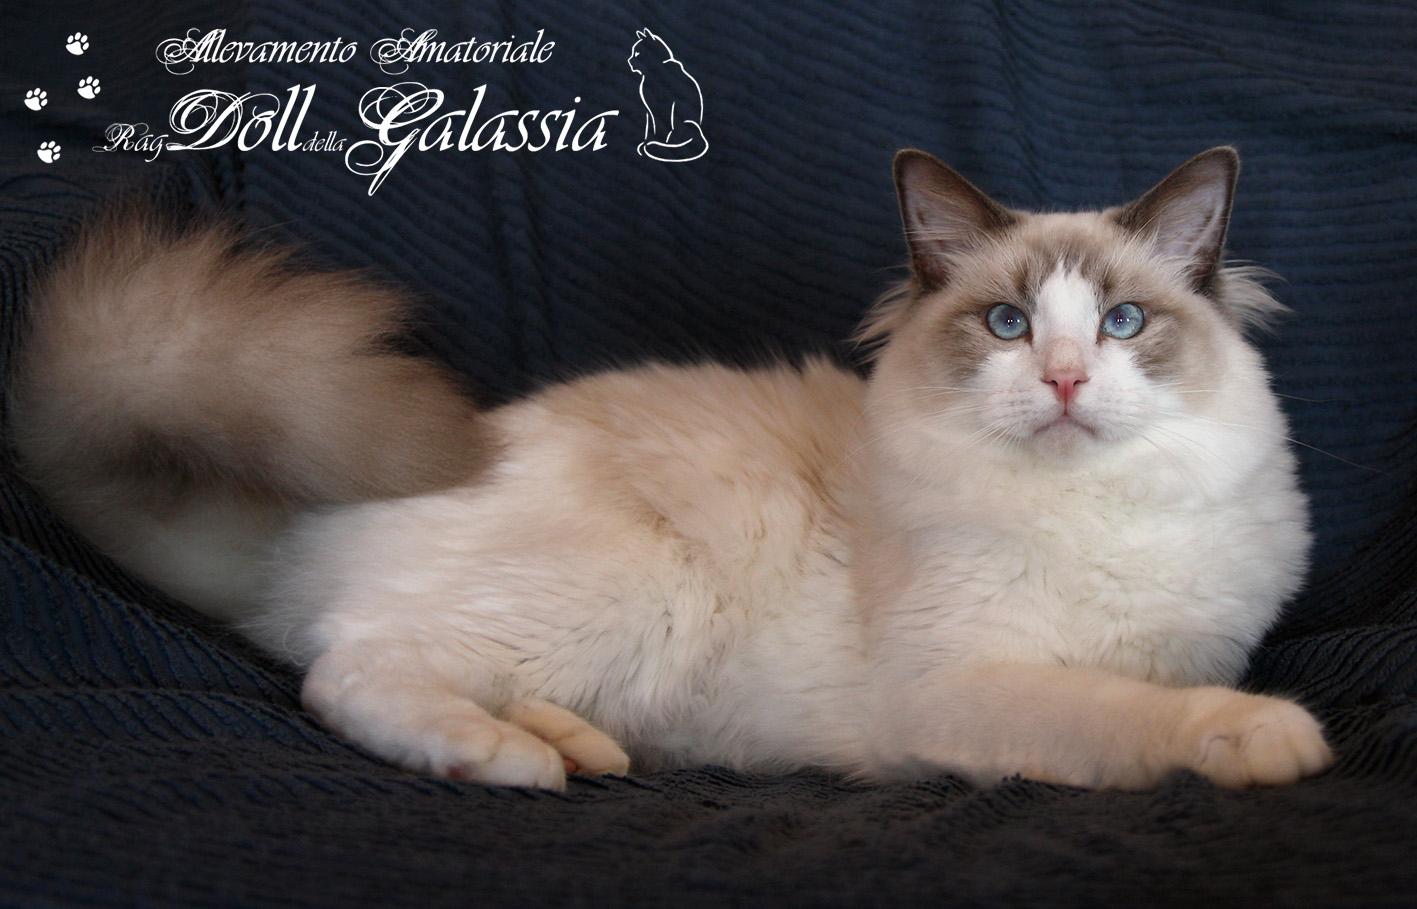 Dollgalassia-Felis-1